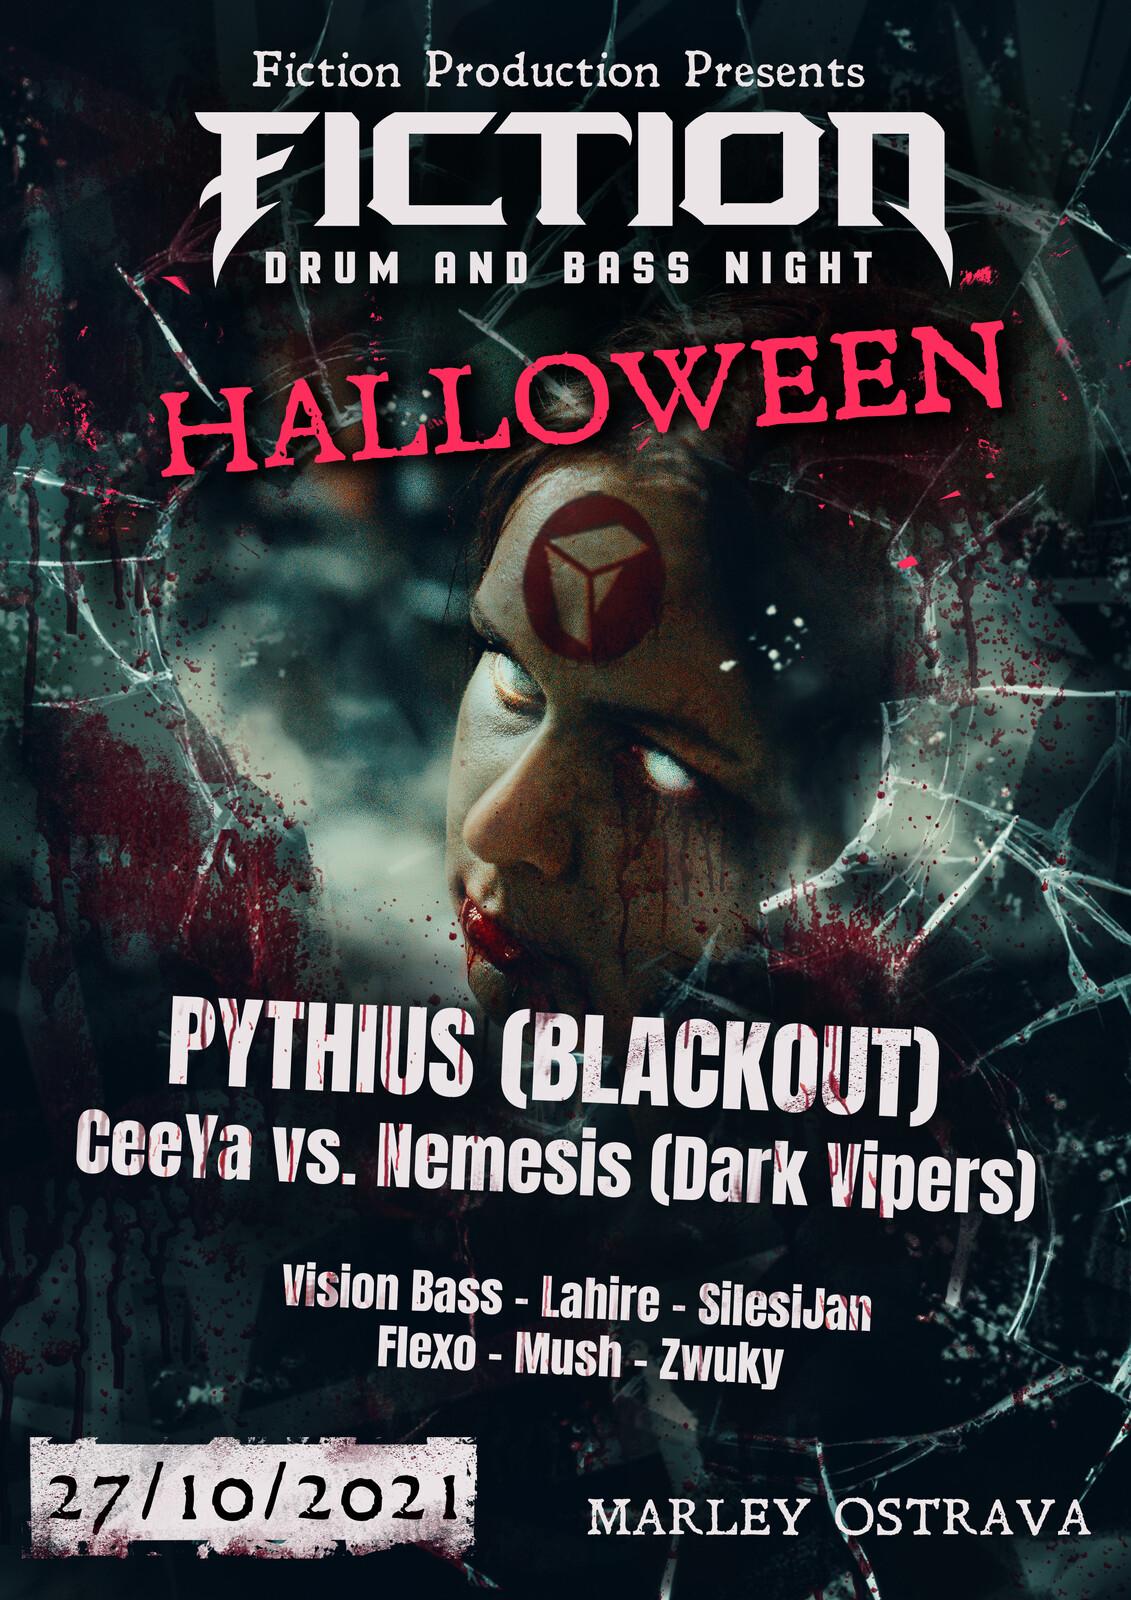 Fiction DnB Halloween night graphics